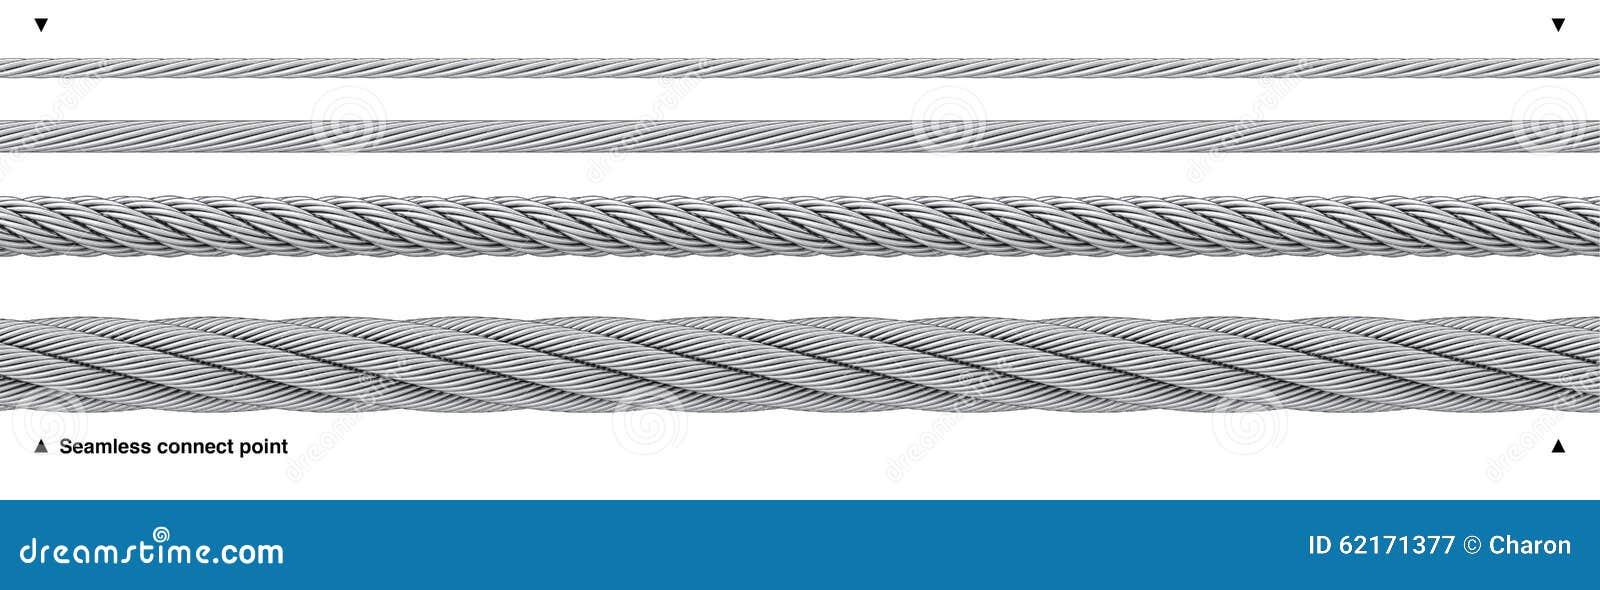 Wiederholbares Drahtseil Des Kabels Des Nahtlosen Stahls Stockbild ...